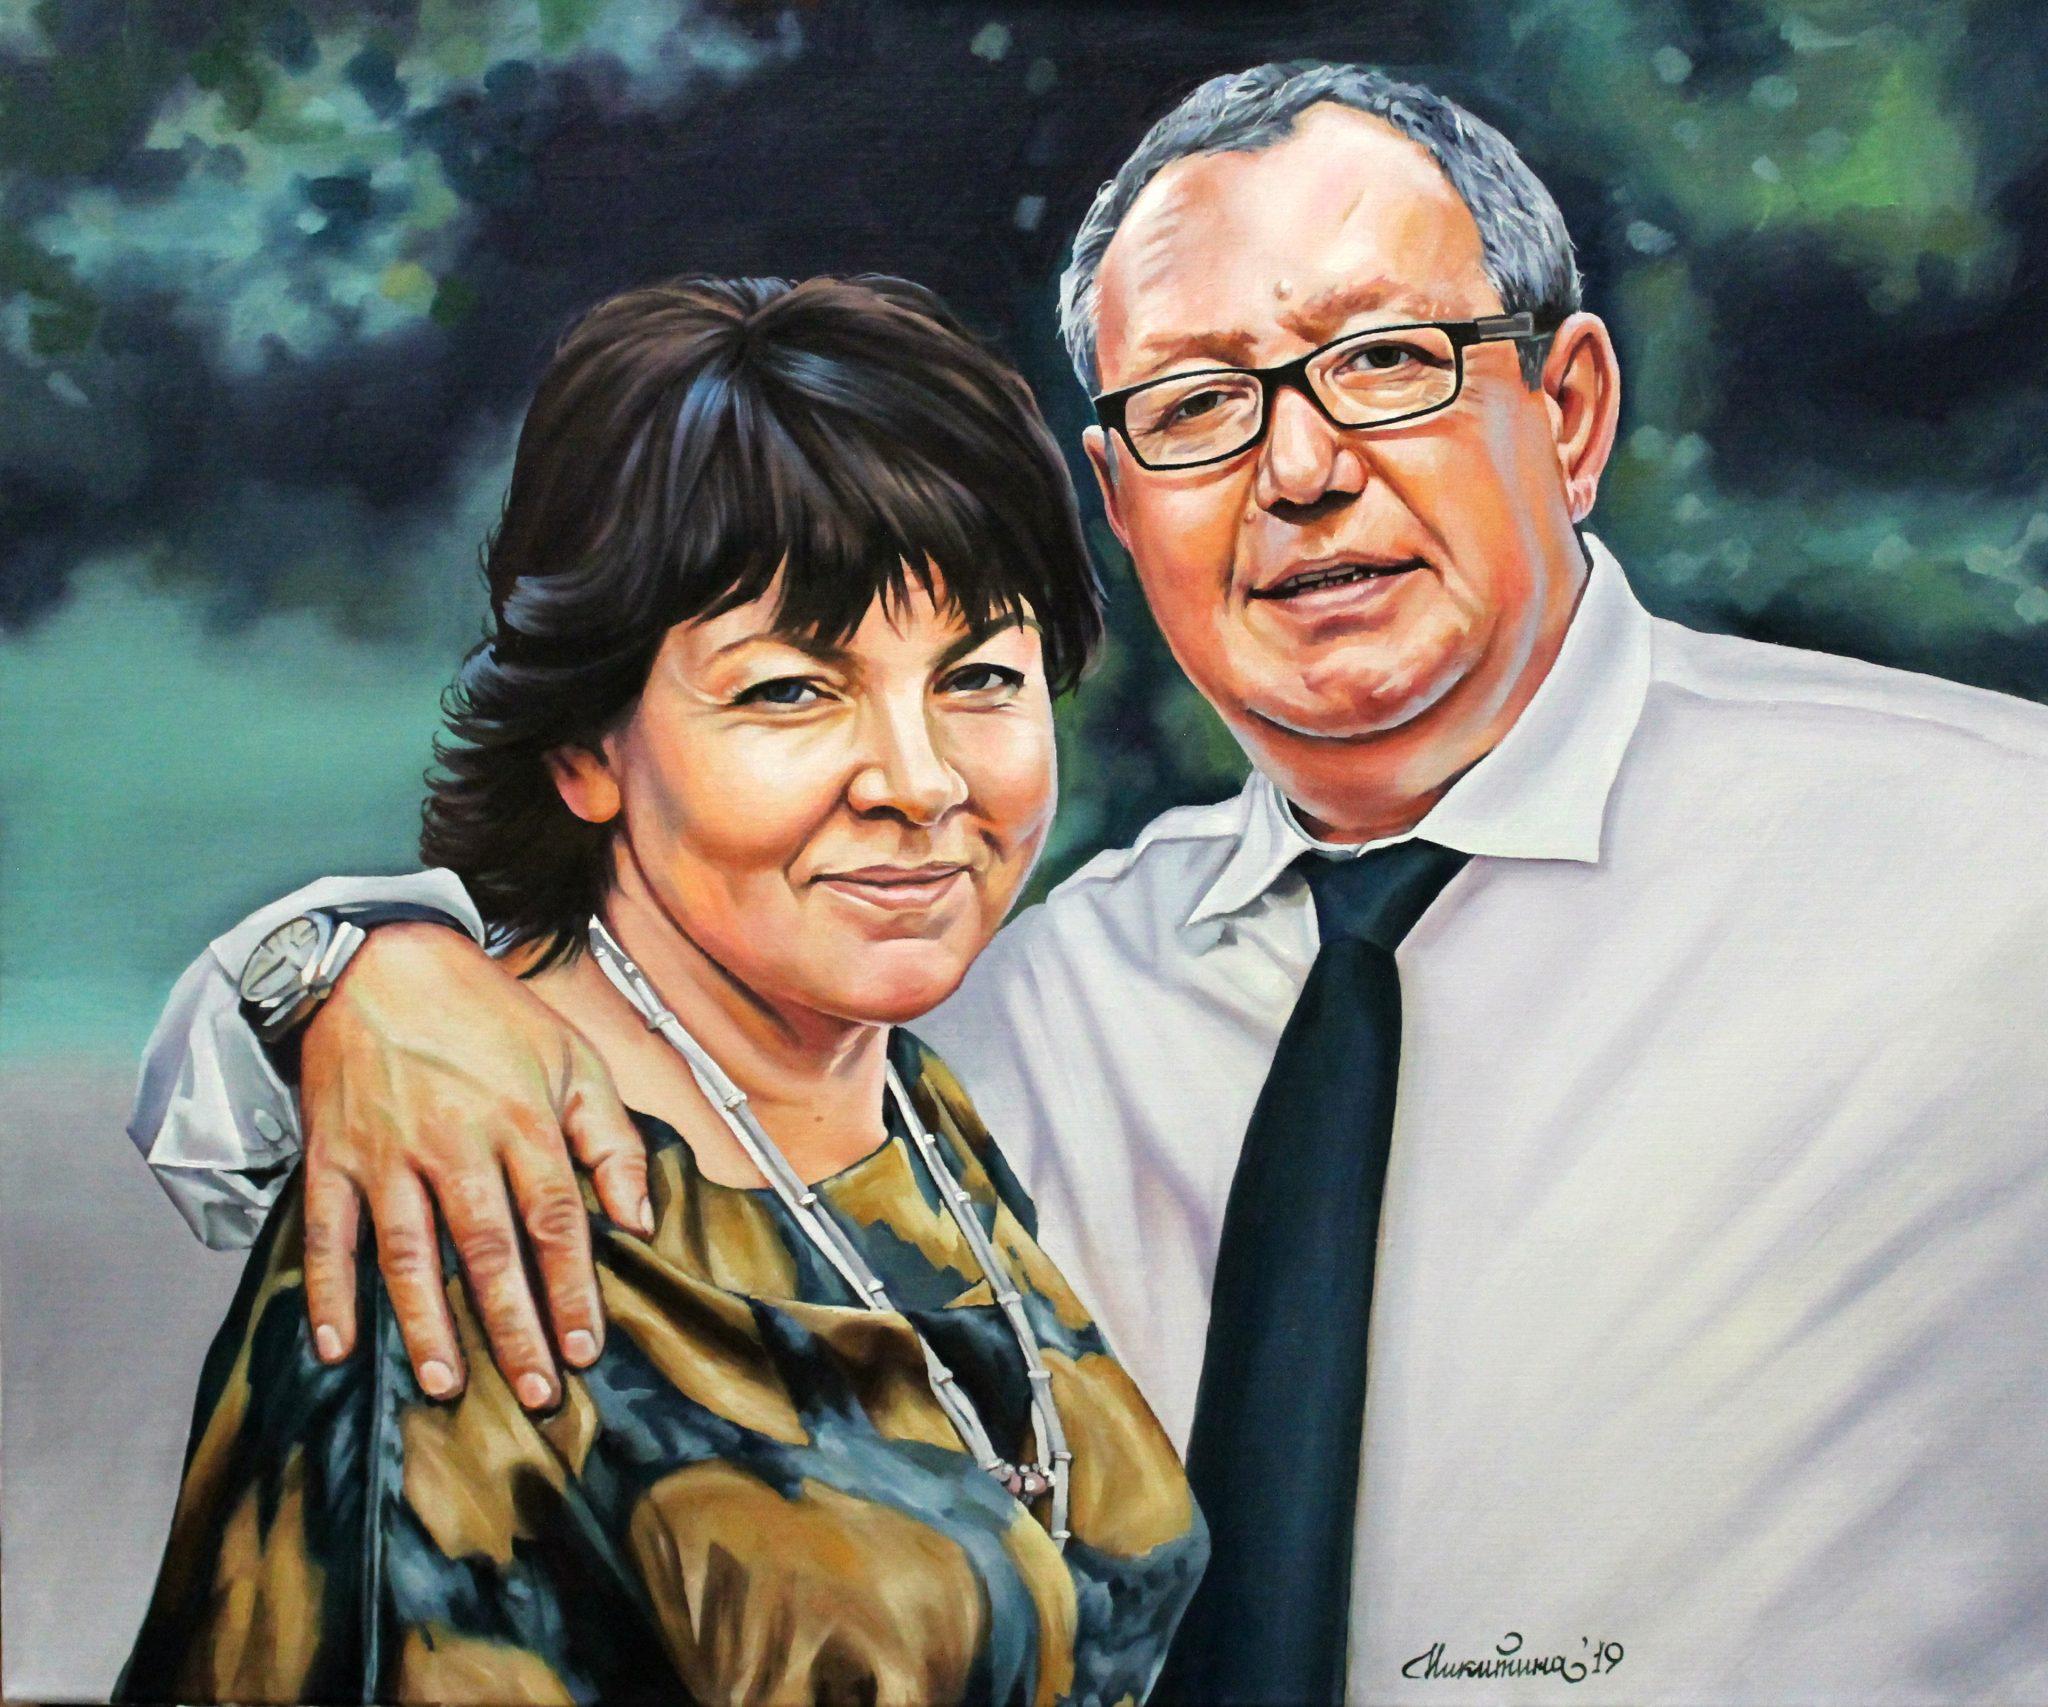 Семейный портрет, 2019г., Холст, масло 50х60 см